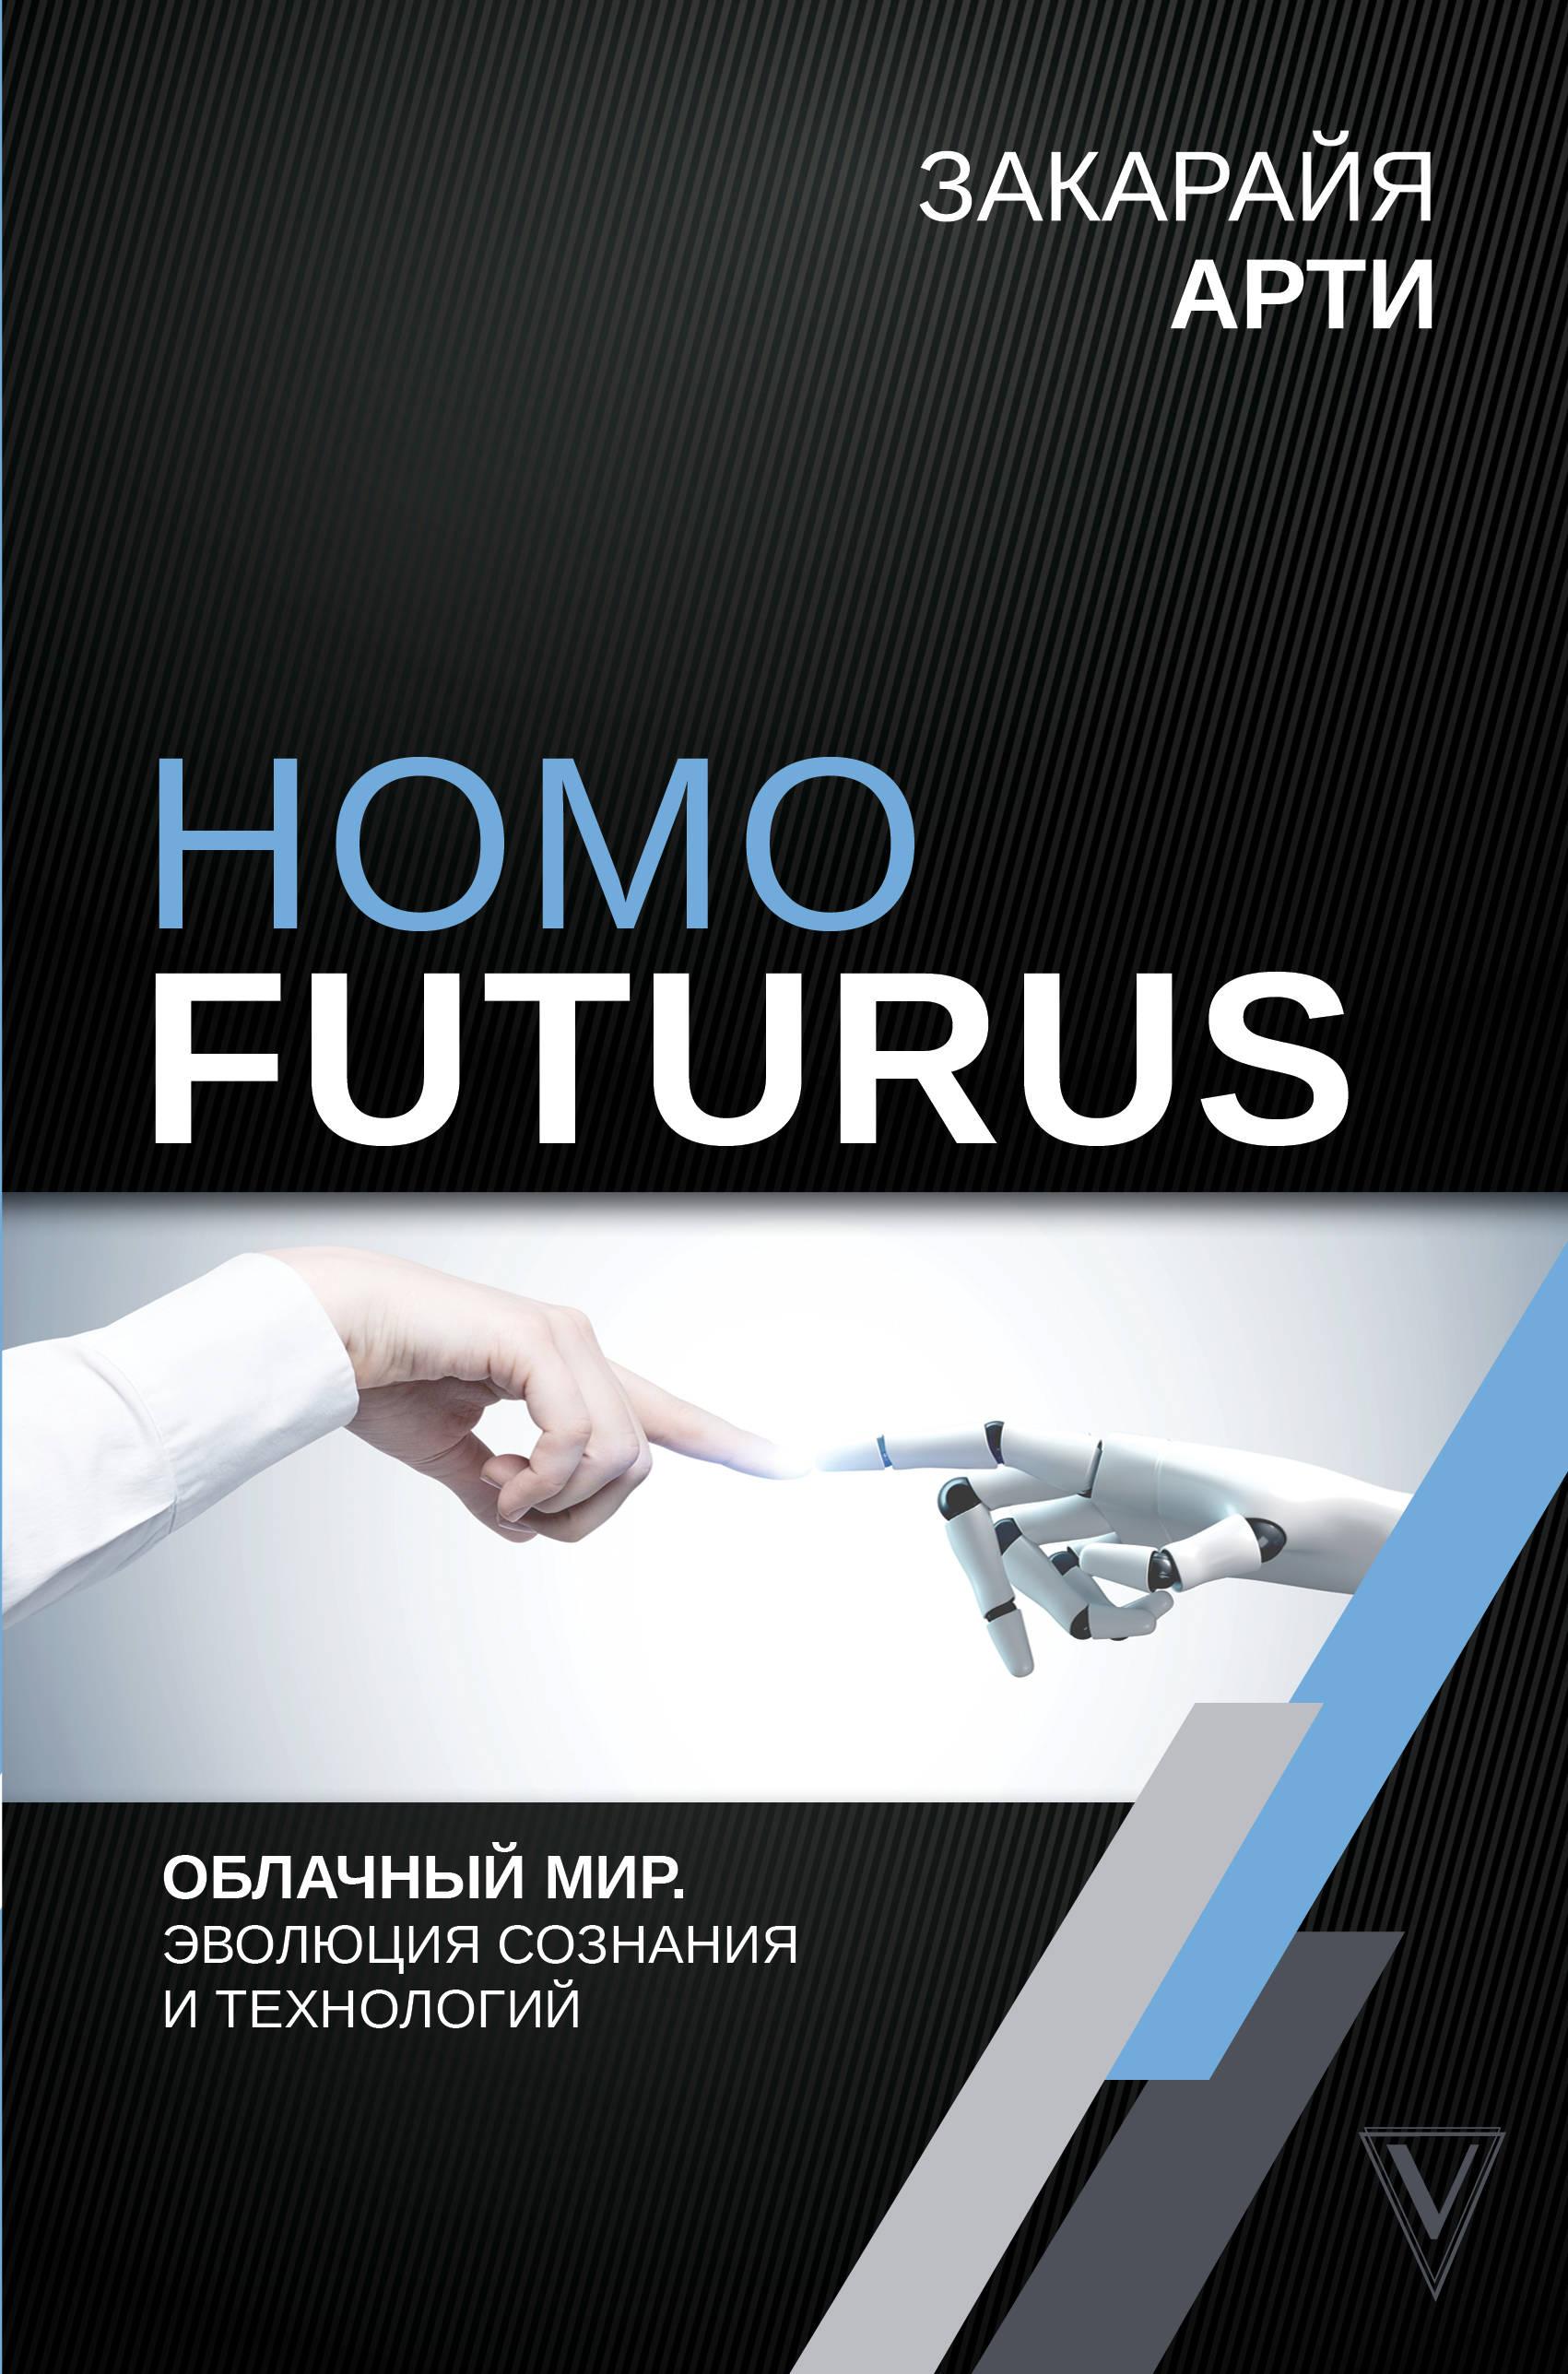 Homo Futurus. Облачный Мир: эволюция сознания и технологий ( Закарайя Арти  )